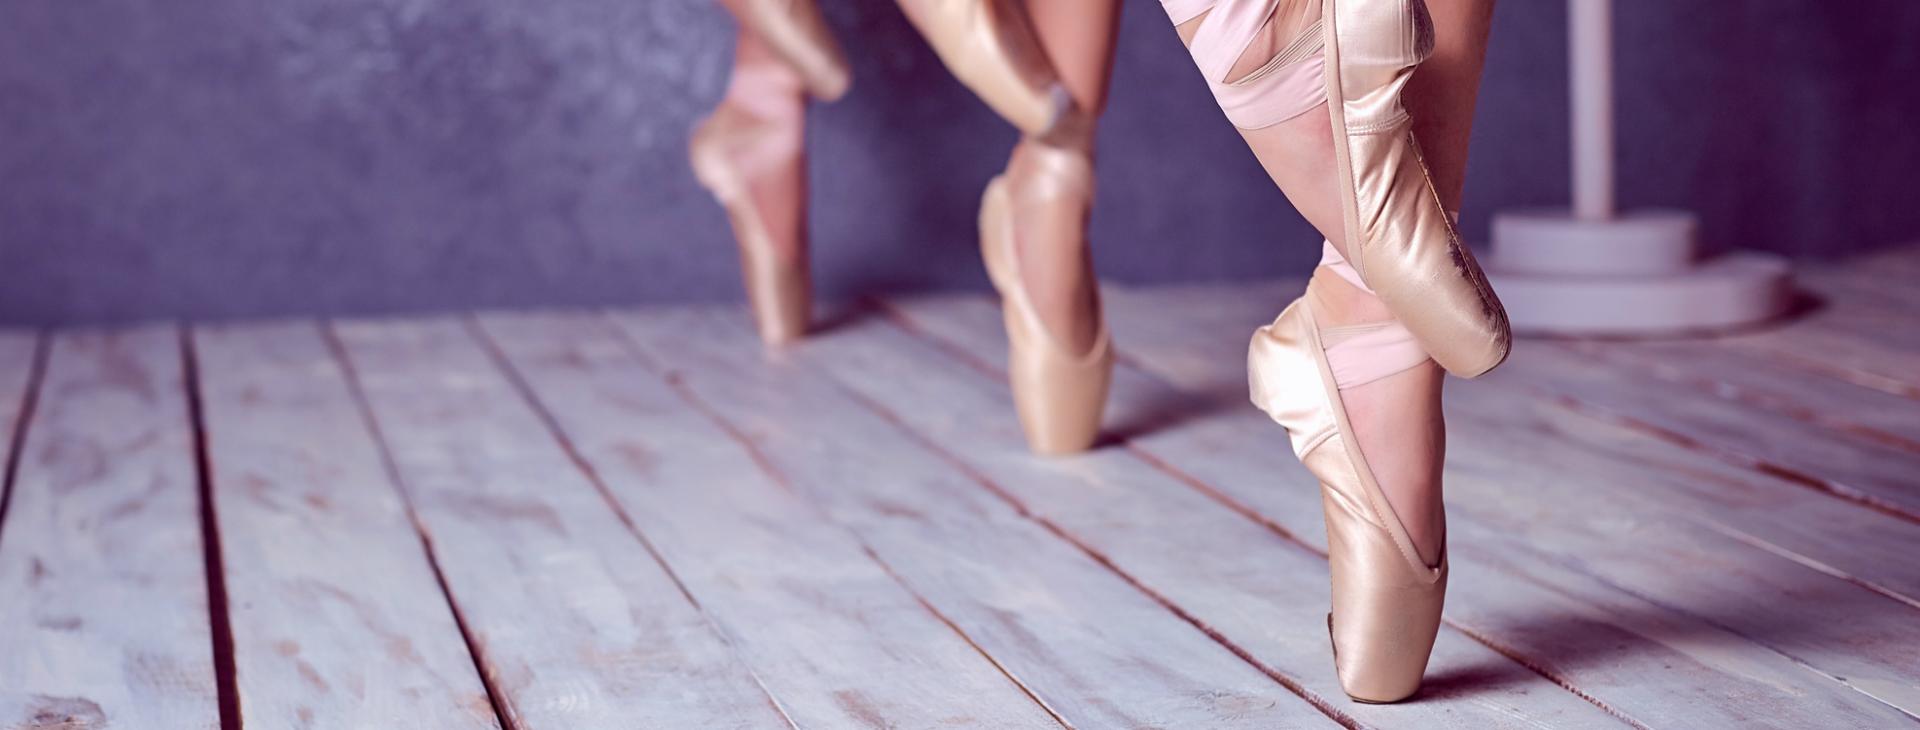 McKinney Dance Academy image 7